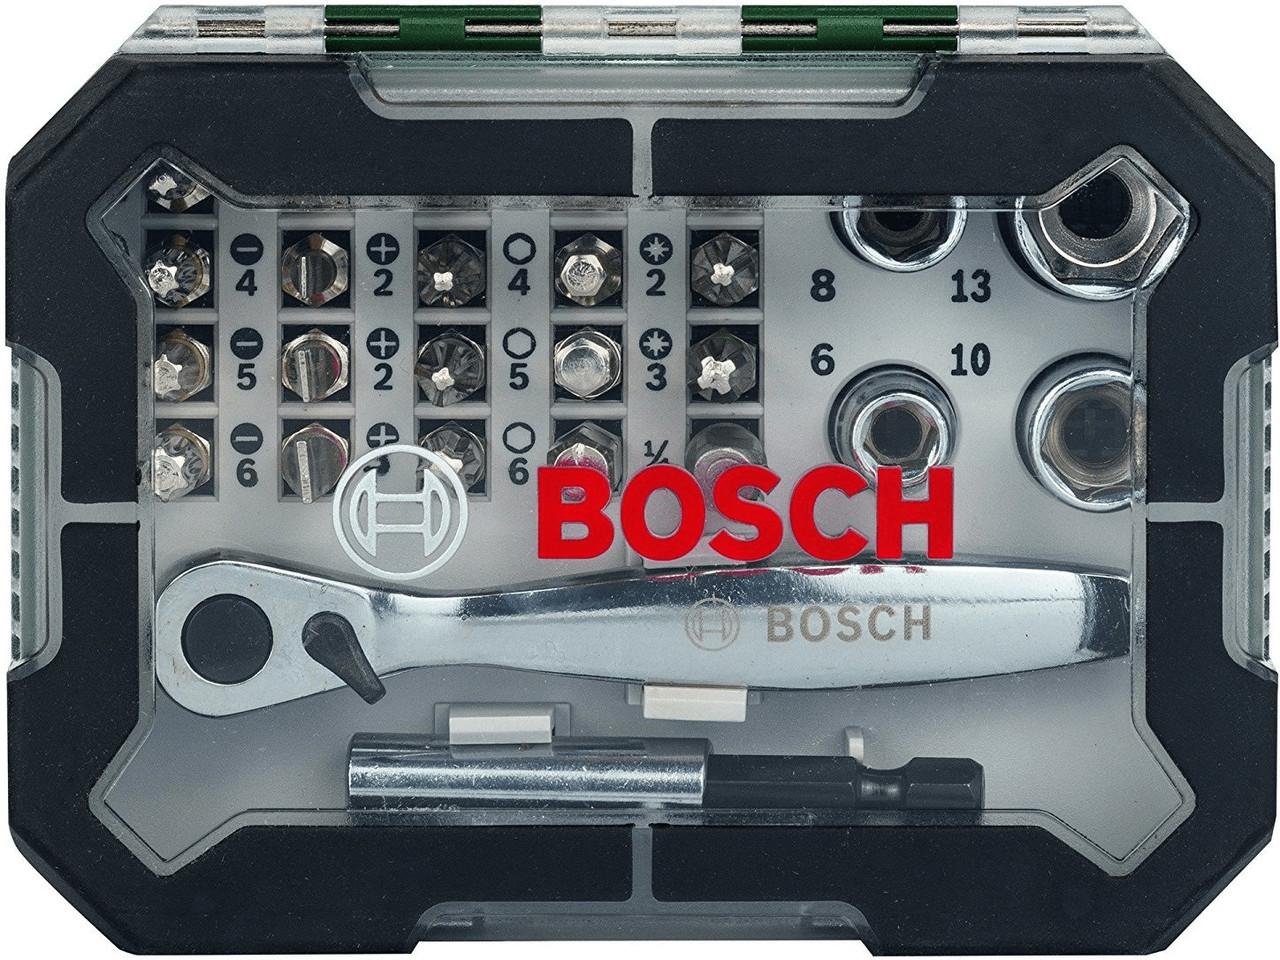 Набір біт та трещоток Bosch, 26 шт